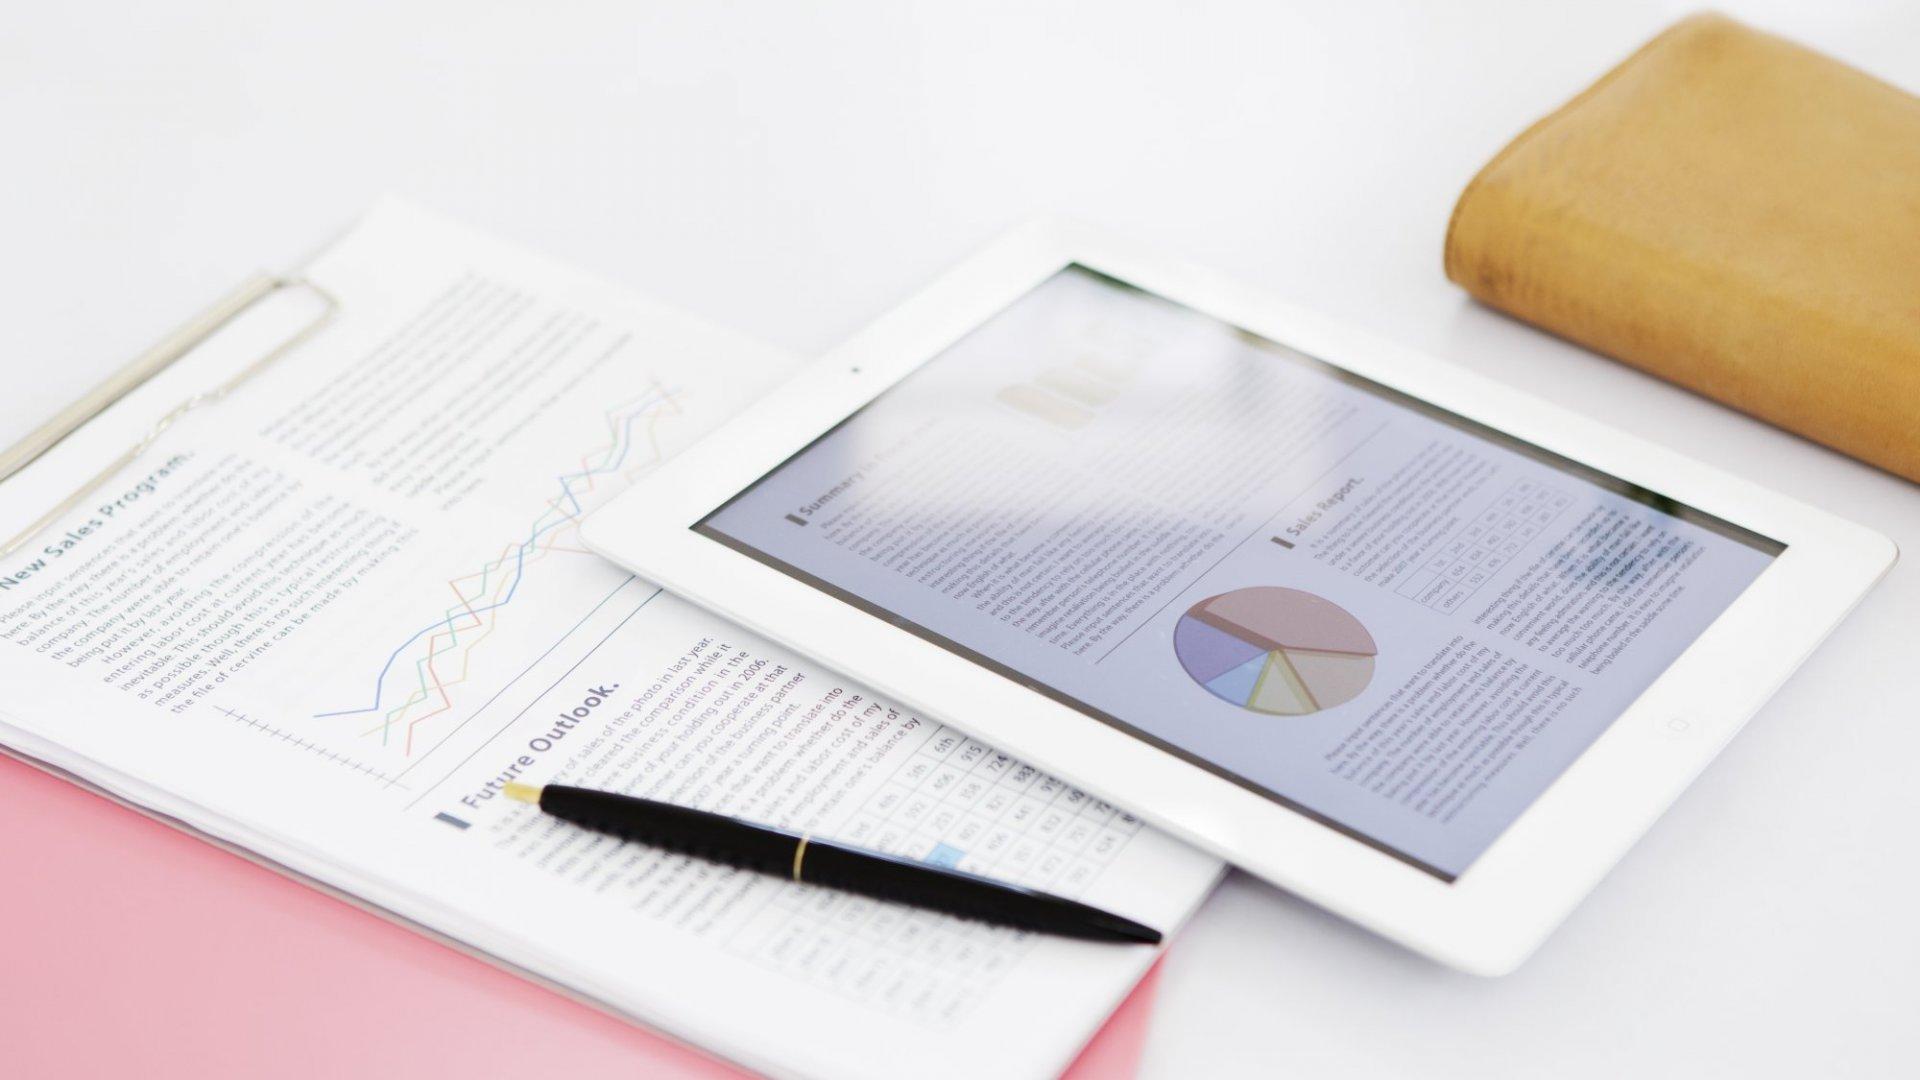 29 Favorite Business Tech Tools of Entrepreneurs in 2015